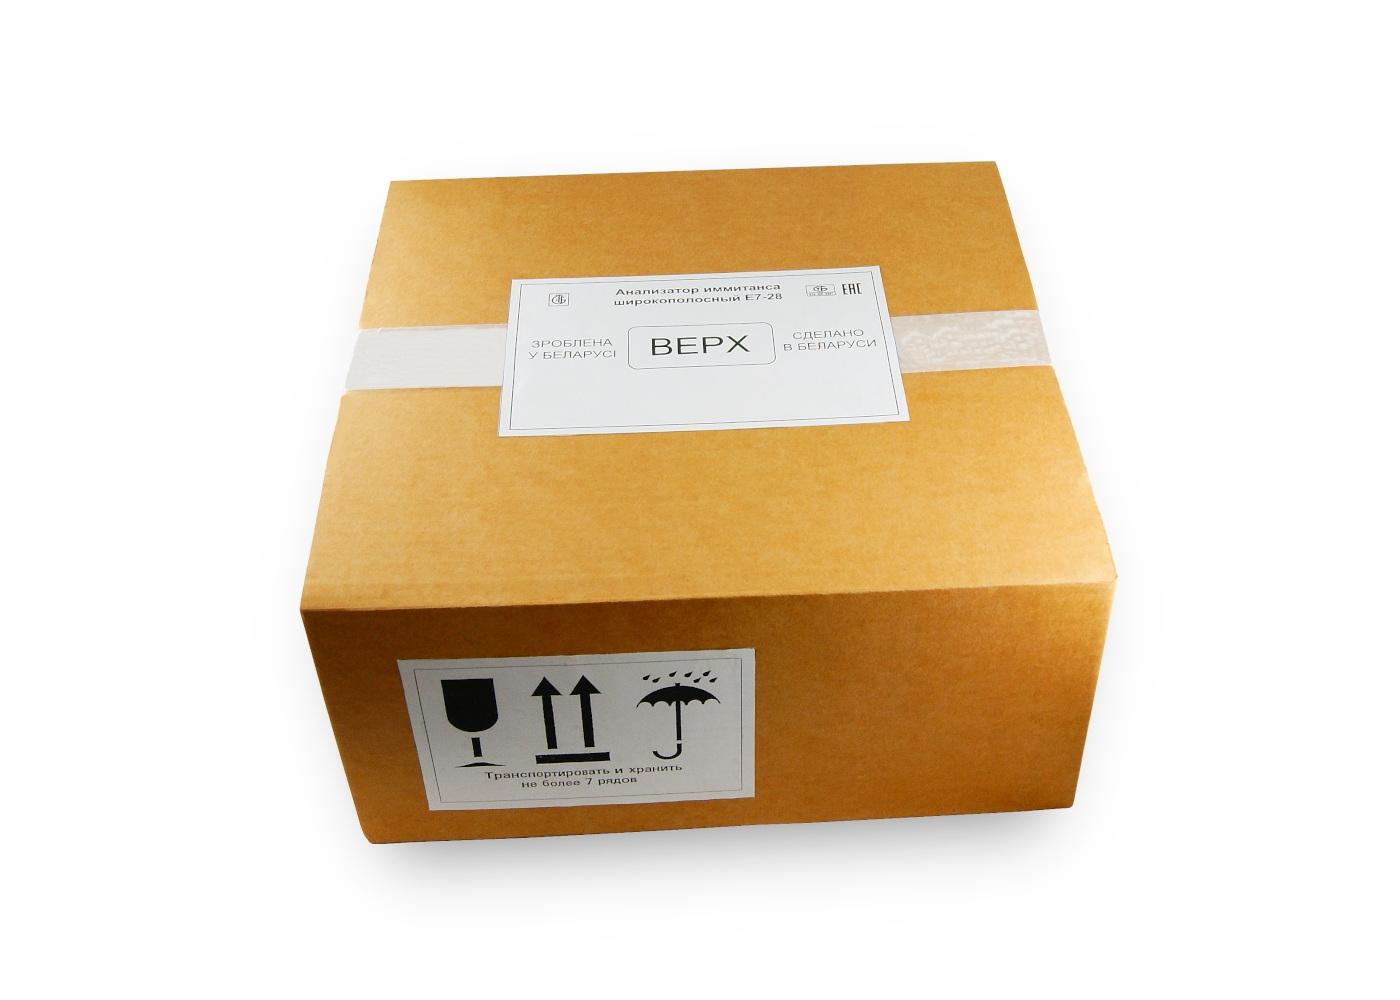 Упаковка для Е7-28